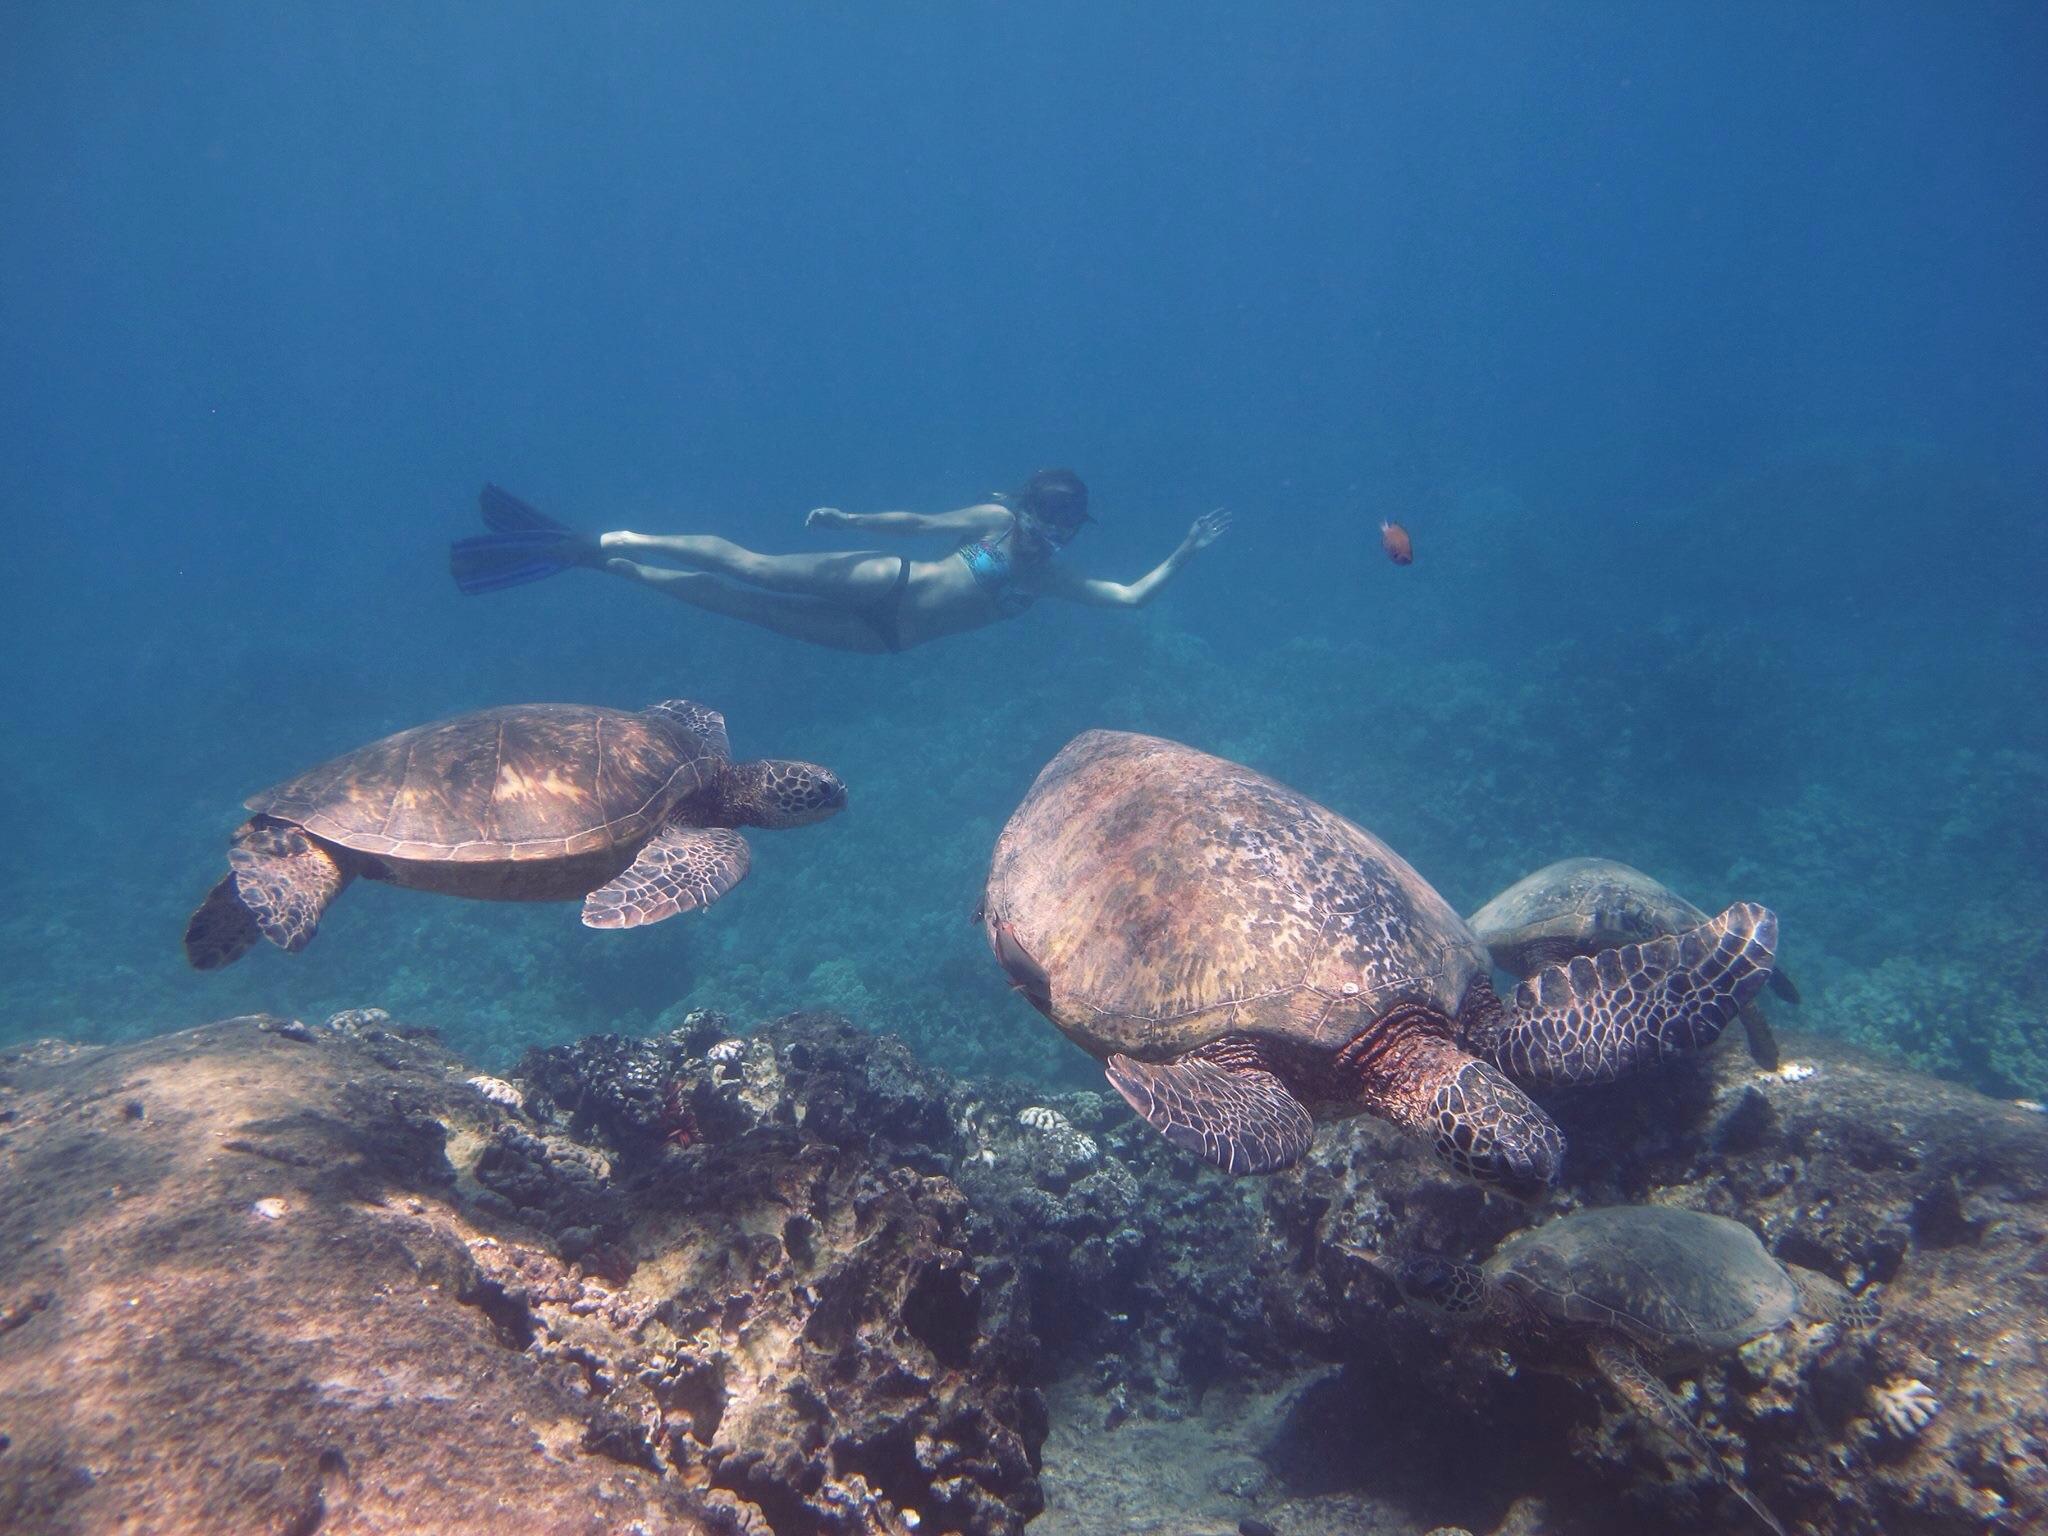 Getting my fill of ocean inspiration. Oahu, Hawaii. Photo:  Gadea Pérez-Andújar